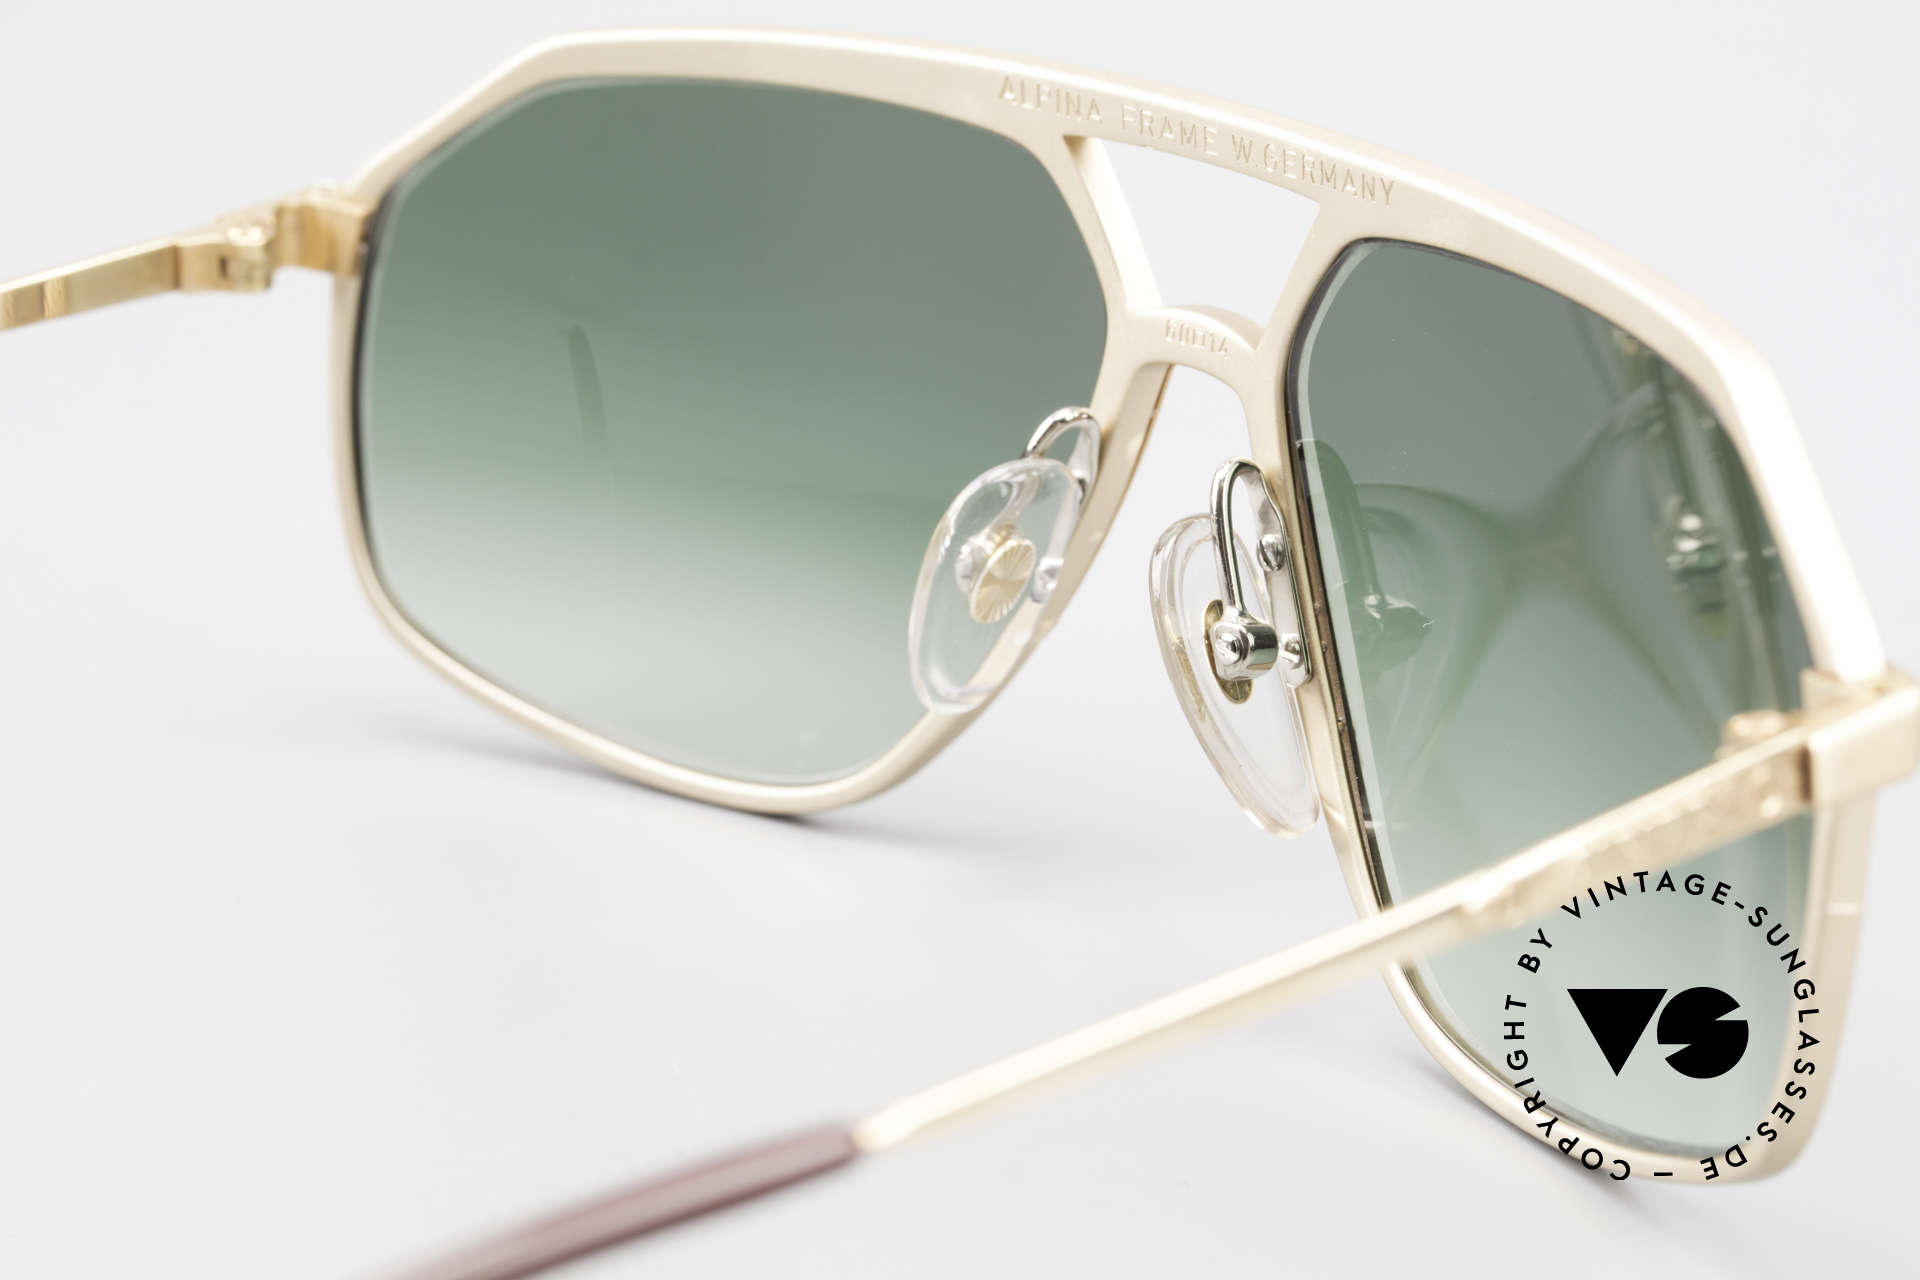 Alpina M6 Legendary 80's Sunglasses, never worn (like all our rare old Alpina sunglasses), Made for Men